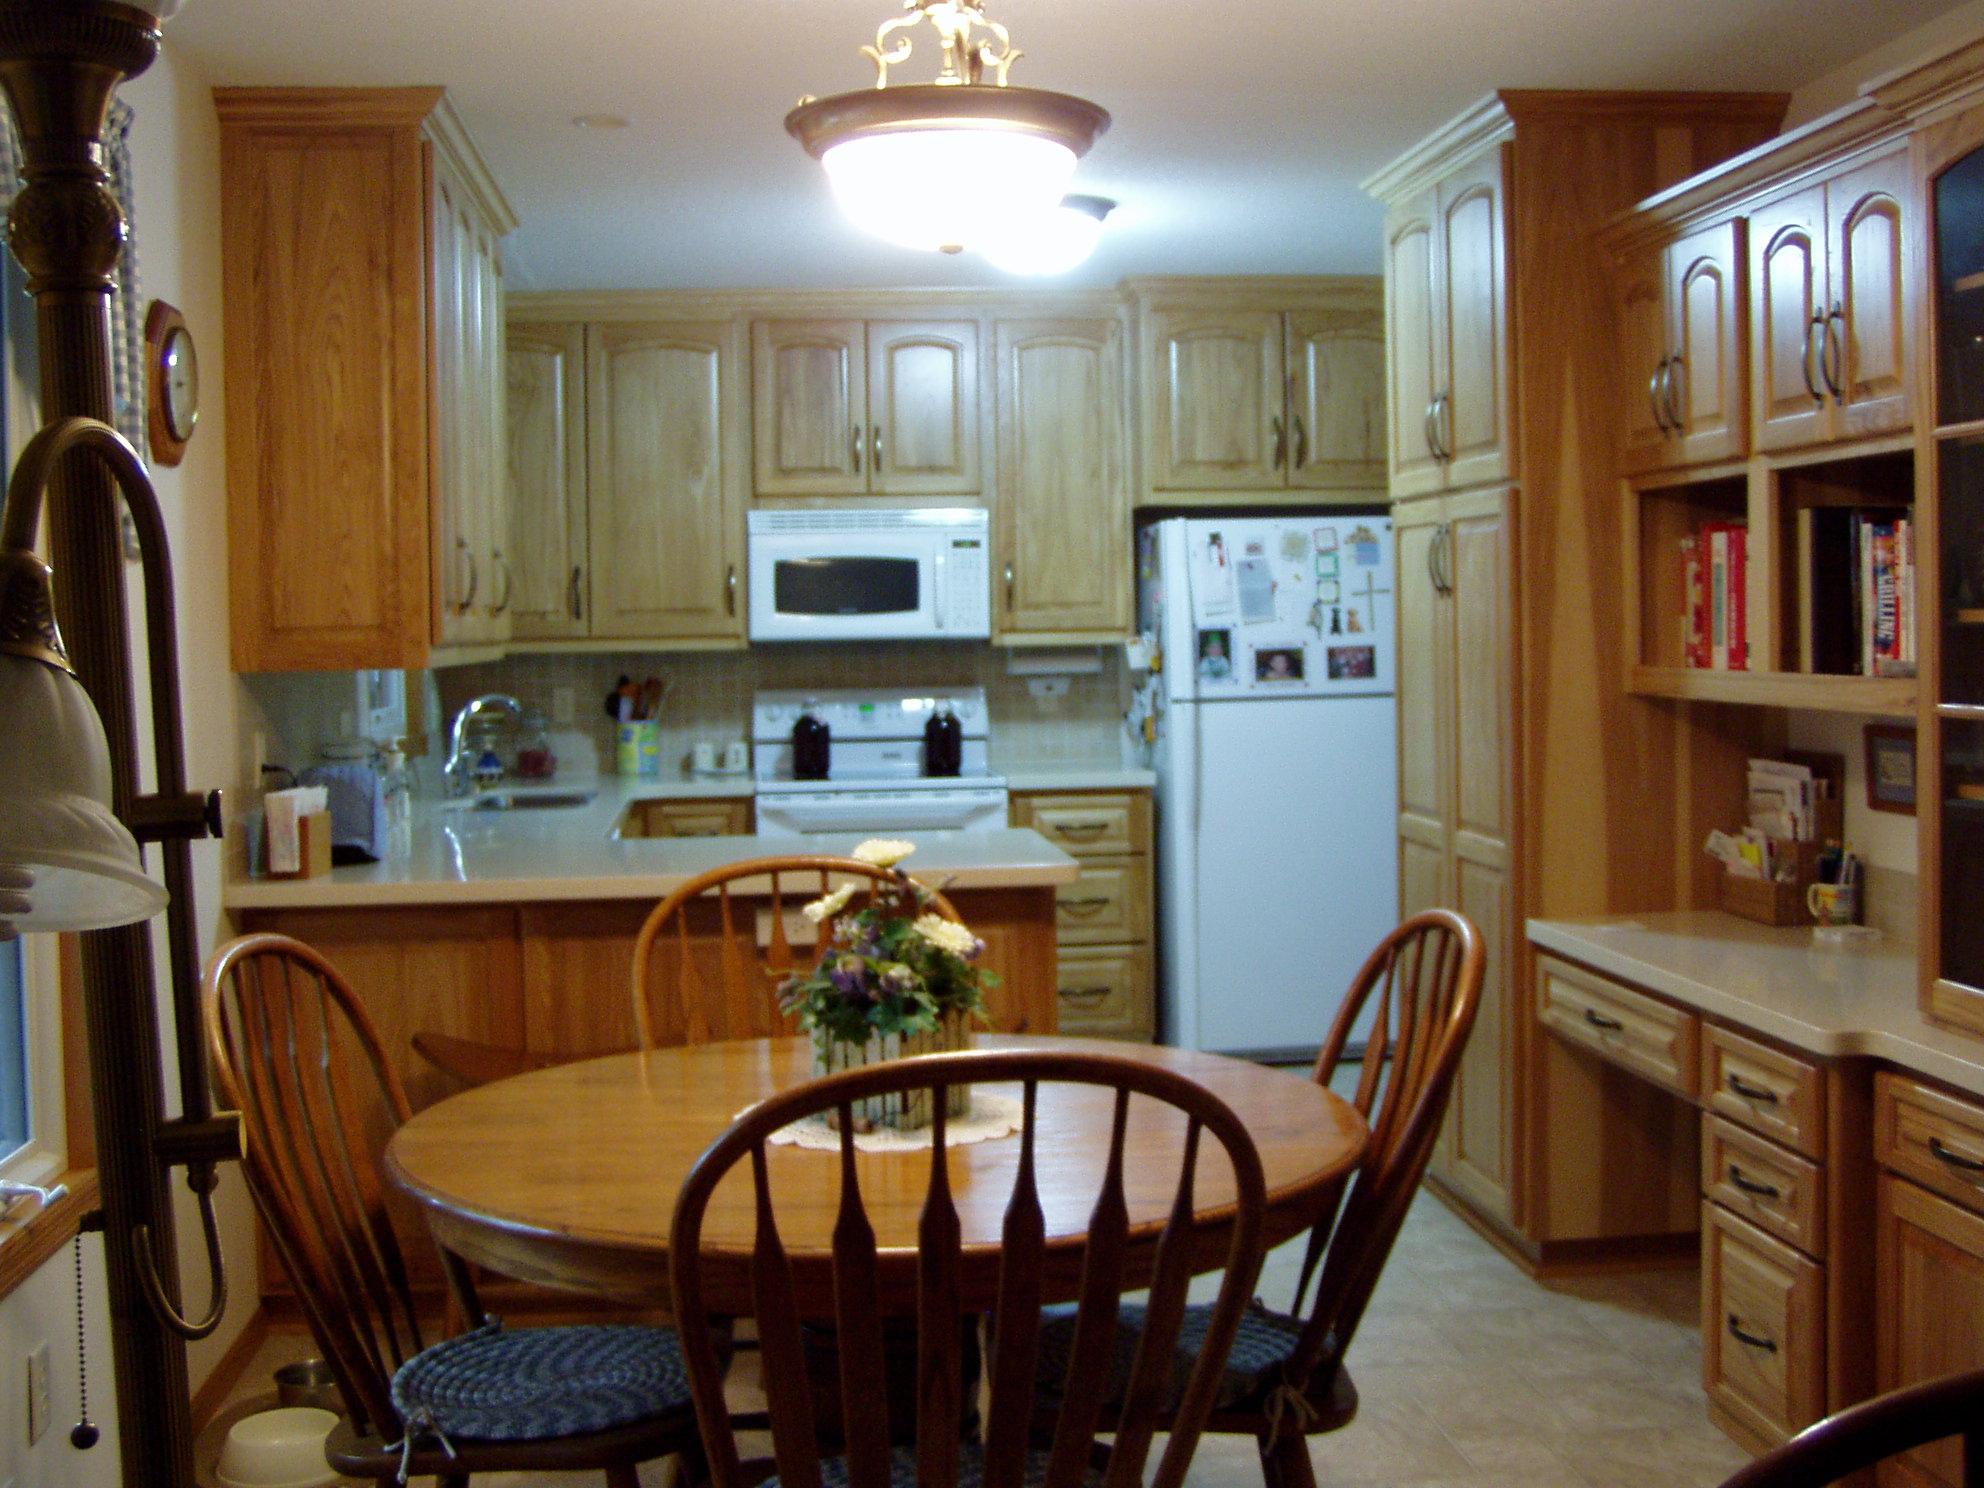 kitchen cabinets knotty alder design pictures hickory kitchens | old school